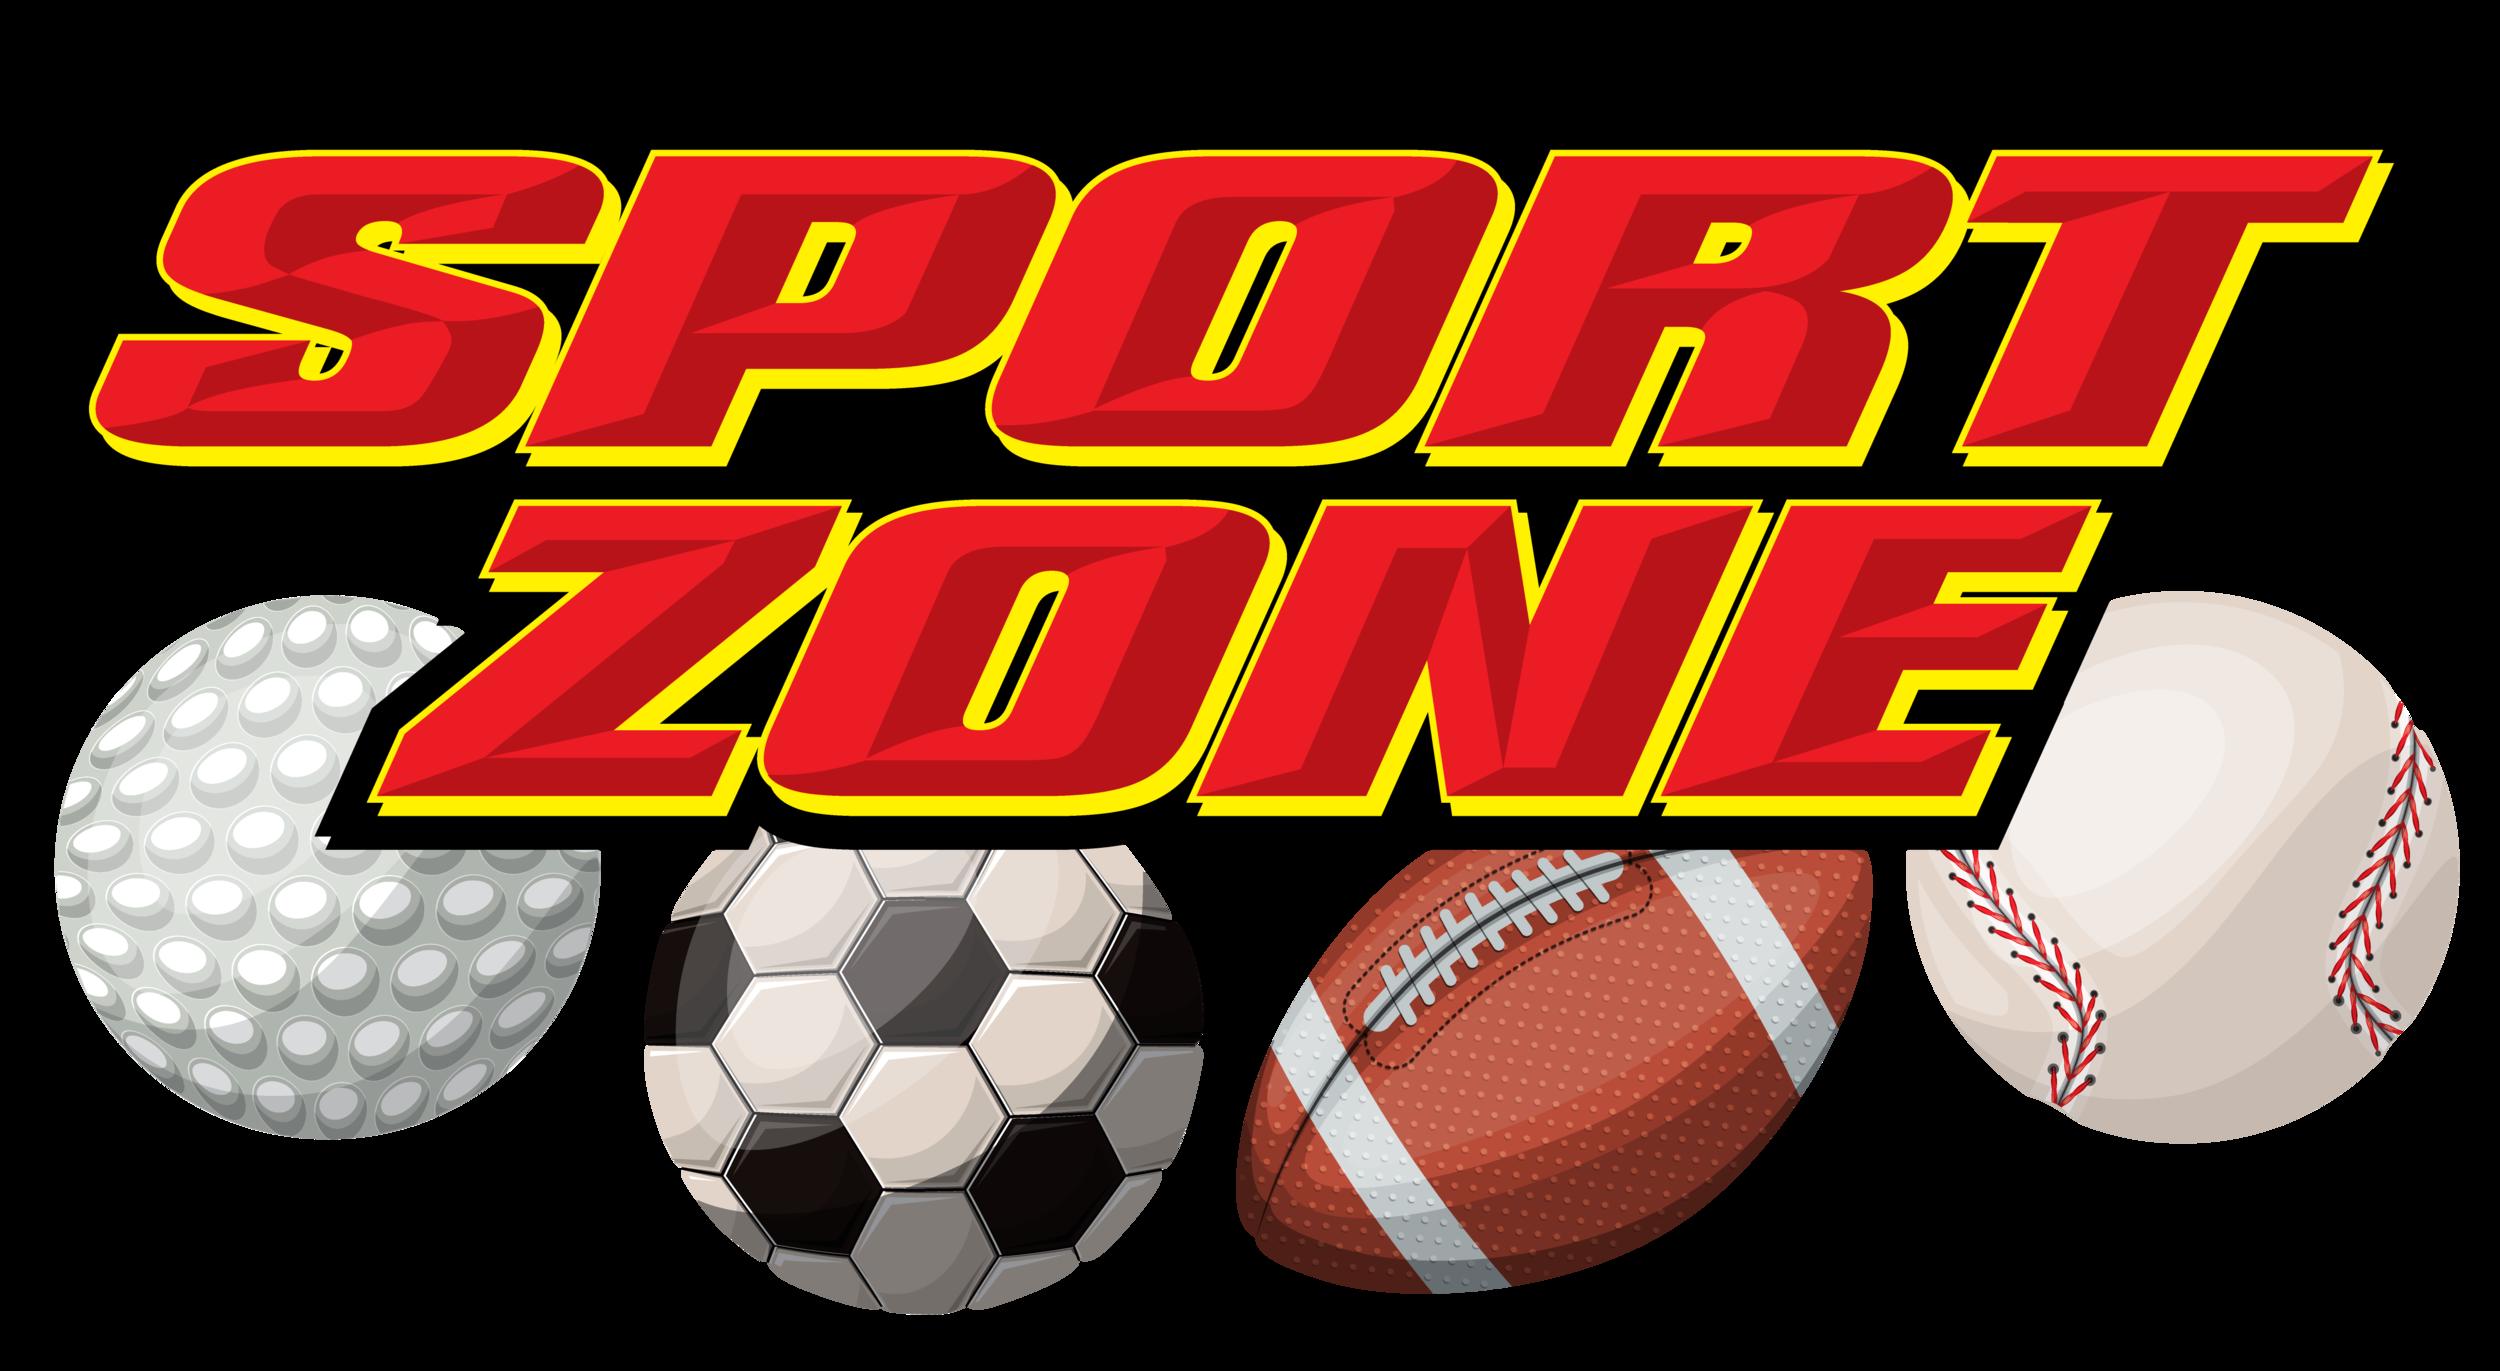 Sports Zone - BIG TEN , BTN , TENNIS , ELEVEN SPORT , FANTASY , FIGHTNET , FSN , GOL TV , GOLF CHANNEL , MAV TV , MOTORSPORT , MSG , MSG 2 , MSG PLUS , NESN BOSTON , NESN MAINE , NESN PLUS , OLYMPIC , PAC 12 WASHINGTON , SPORTSNET , STADIUM , FOX SPORTS , FS1 , FS2 , YES NETWORK , BTN 1 , BTN 2 , BTN 3 , BTN 4 , FS FCSA , FS FCSC , FOX SPORTS GO , PRIME , ESPN , ESPN 2 , ESPN L.N , ESPN NEWS , ESPN SEC , USPN U , ESPN STAR , ESPN + , BEIN SPORT , BEIN SPORTS , BEIN NBA , SKY SPORTS , TEN CRICKET , WILLOW , CRICKET MATCH.